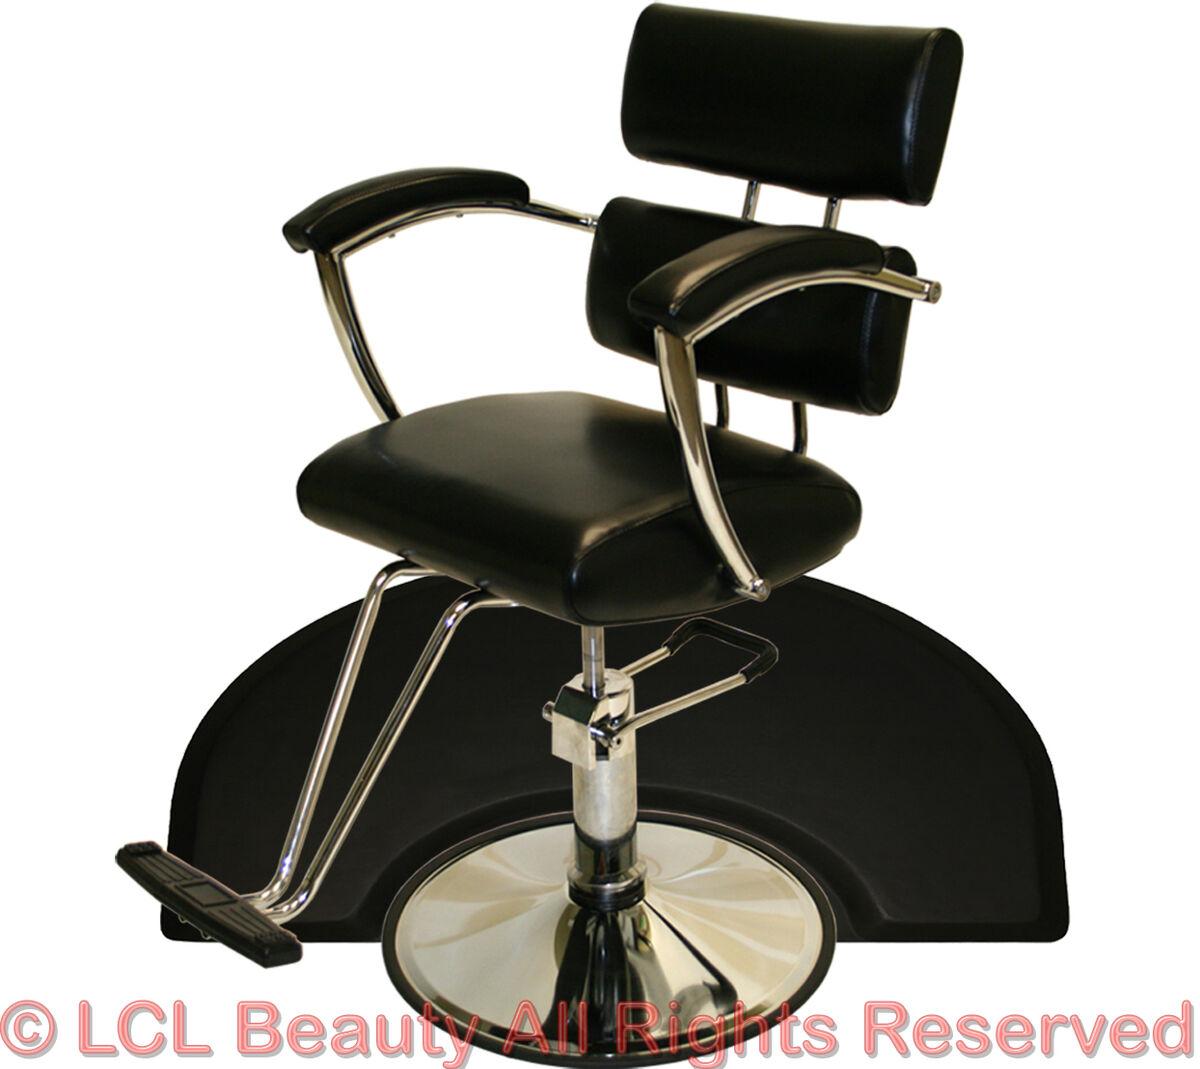 New Sturdy Chrome Hydraulic Barber Chair Styling Hair Mat Beauty Salon Equipment